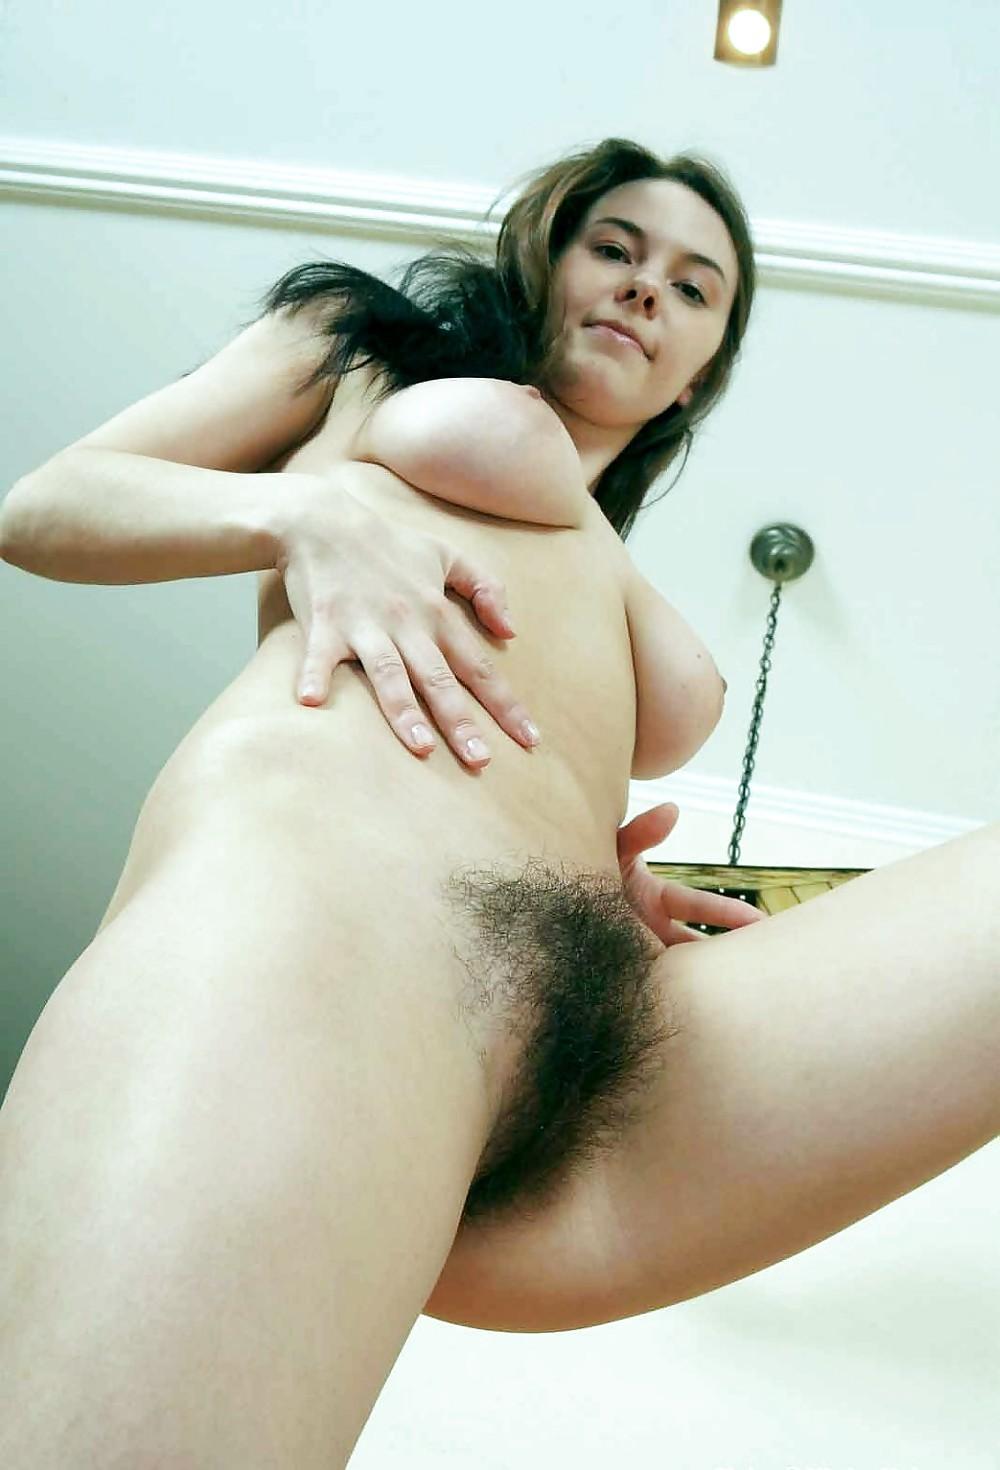 kerala-natural-hairy-pussy-nasty-naked